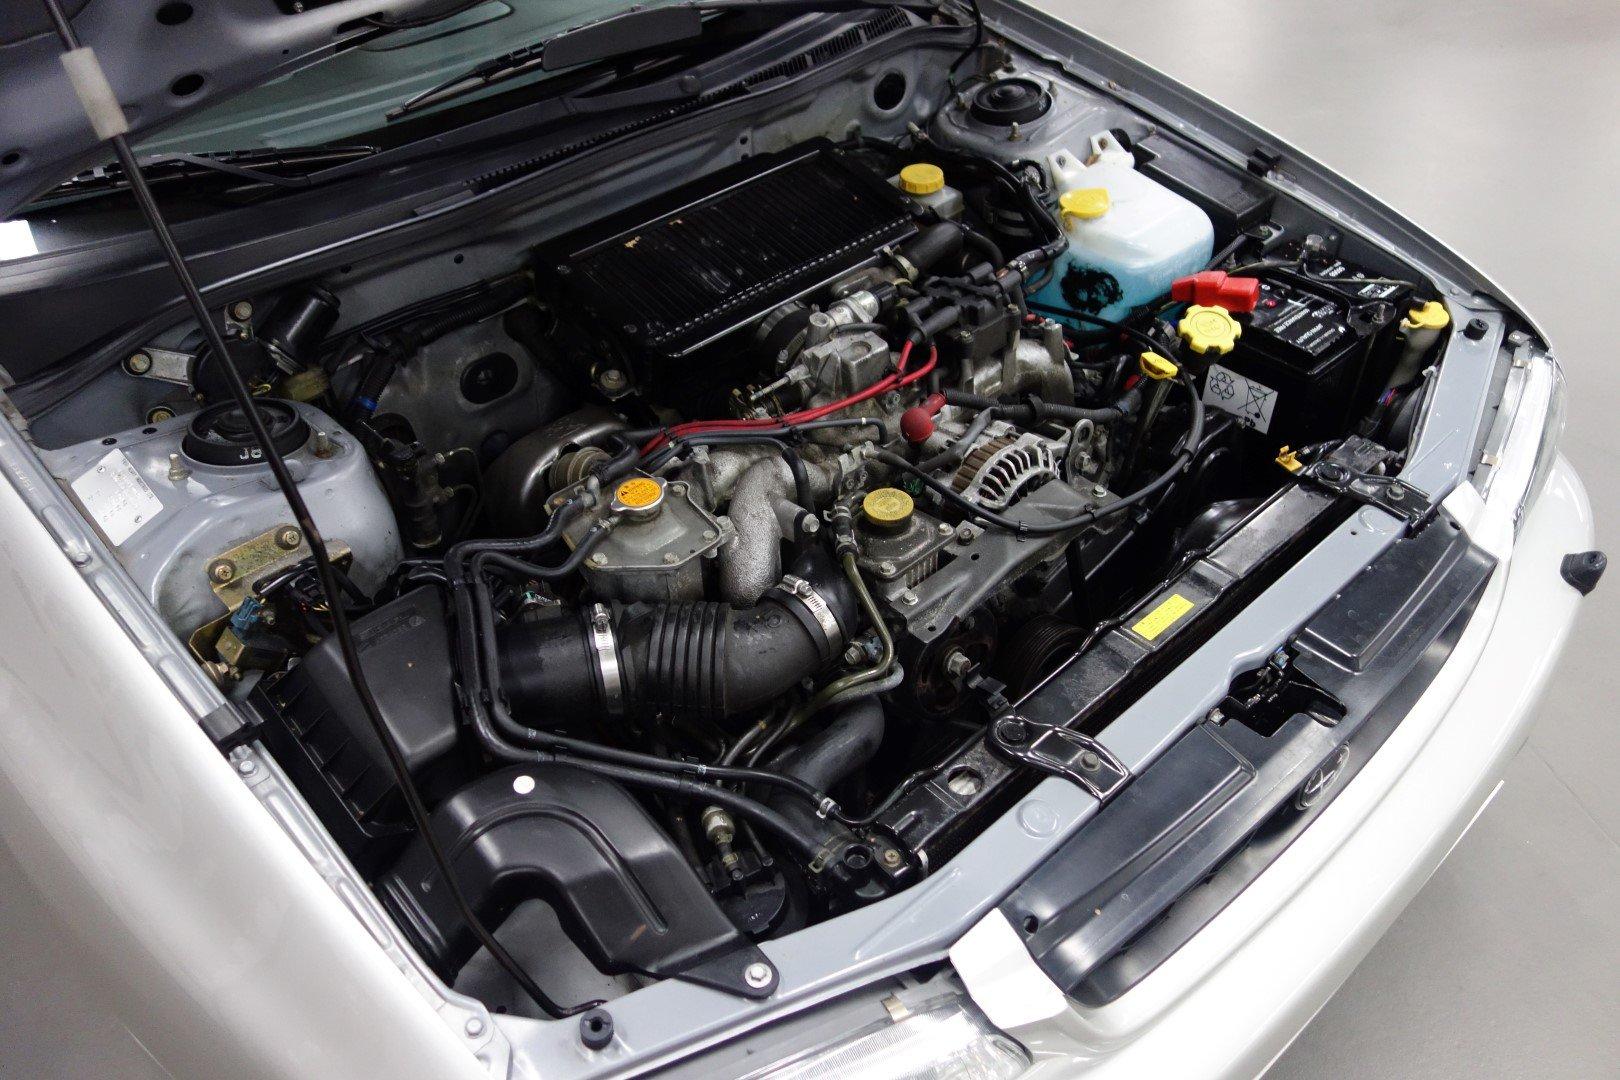 2001 Subaru Impreza 2.0 GT AWD Turbo For Sale (picture 4 of 6)